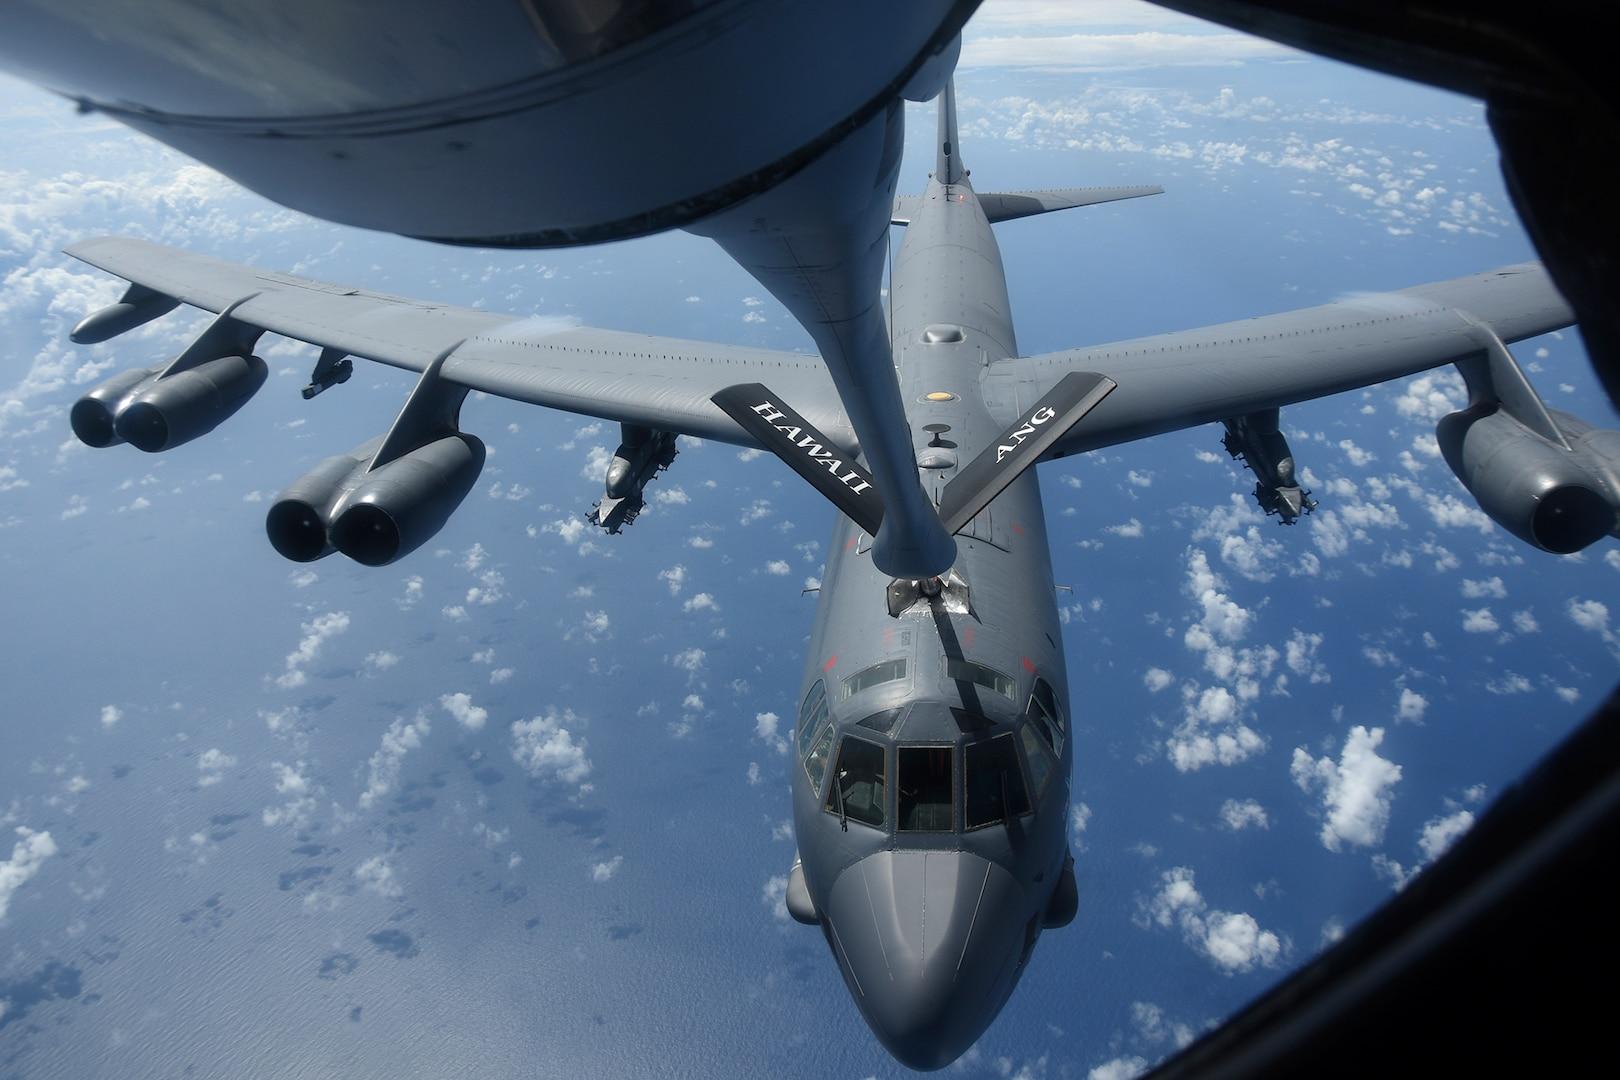 U.S. Air Force B-52s train with U.S. Navy P-8s in East China Sea